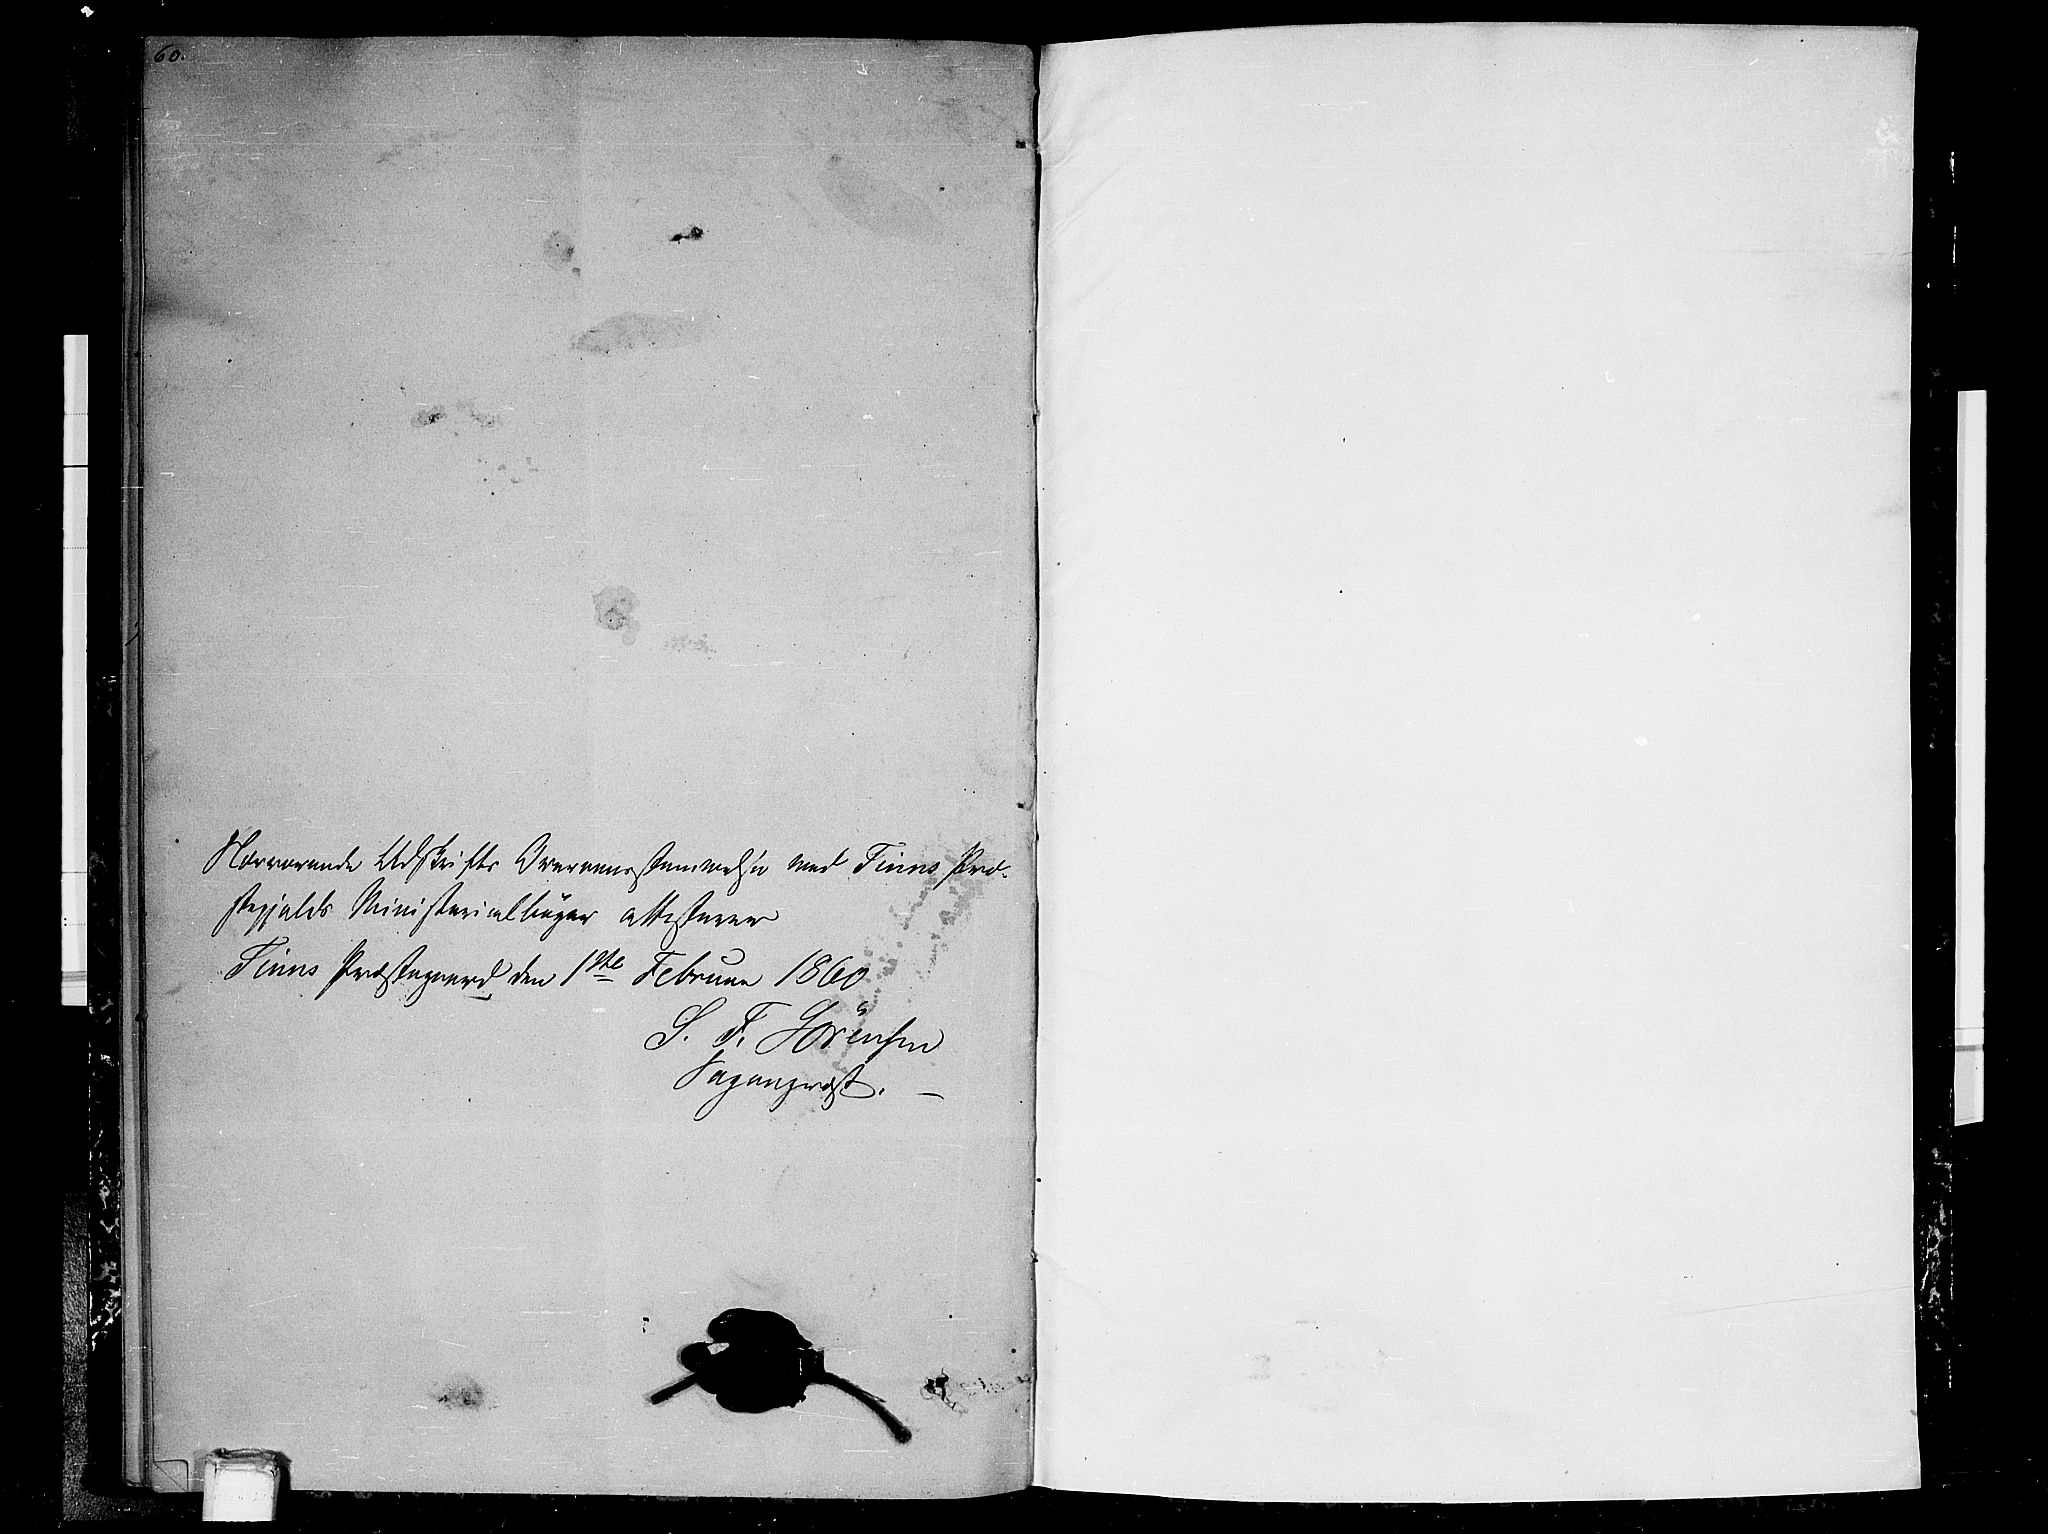 SAKO, Gransherad kirkebøker, F/Fb/L0001: Ministerialbok nr. II 1, 1800-1814, s. 60-61